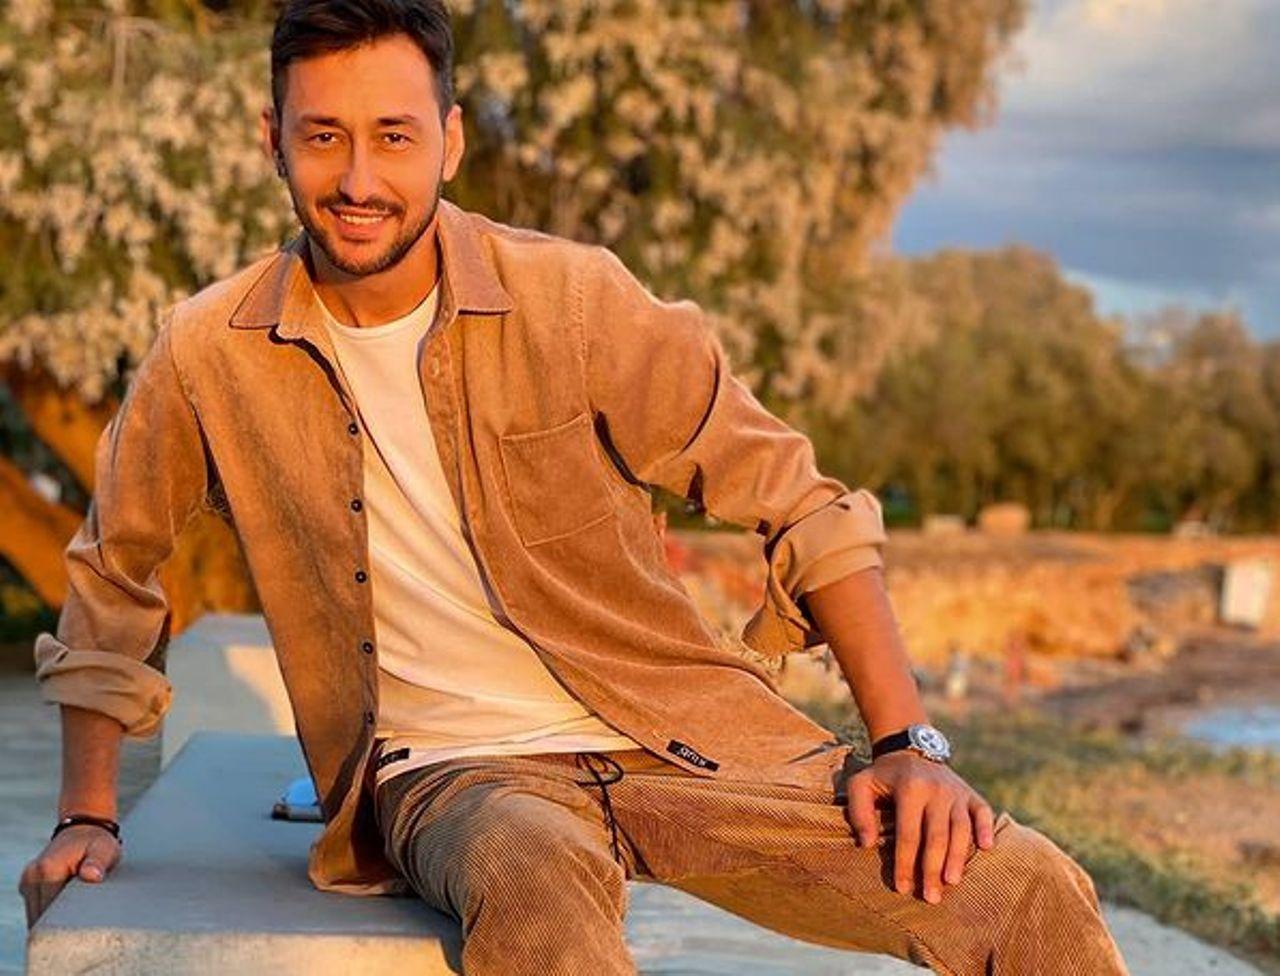 Survivor 4: Ο Πάνος Καλίδης «σφάζει με το γάντι» τον Αλέξη Παππά - «Εκτός από ηθοποιός είναι και καλός σκηνοθέτης»